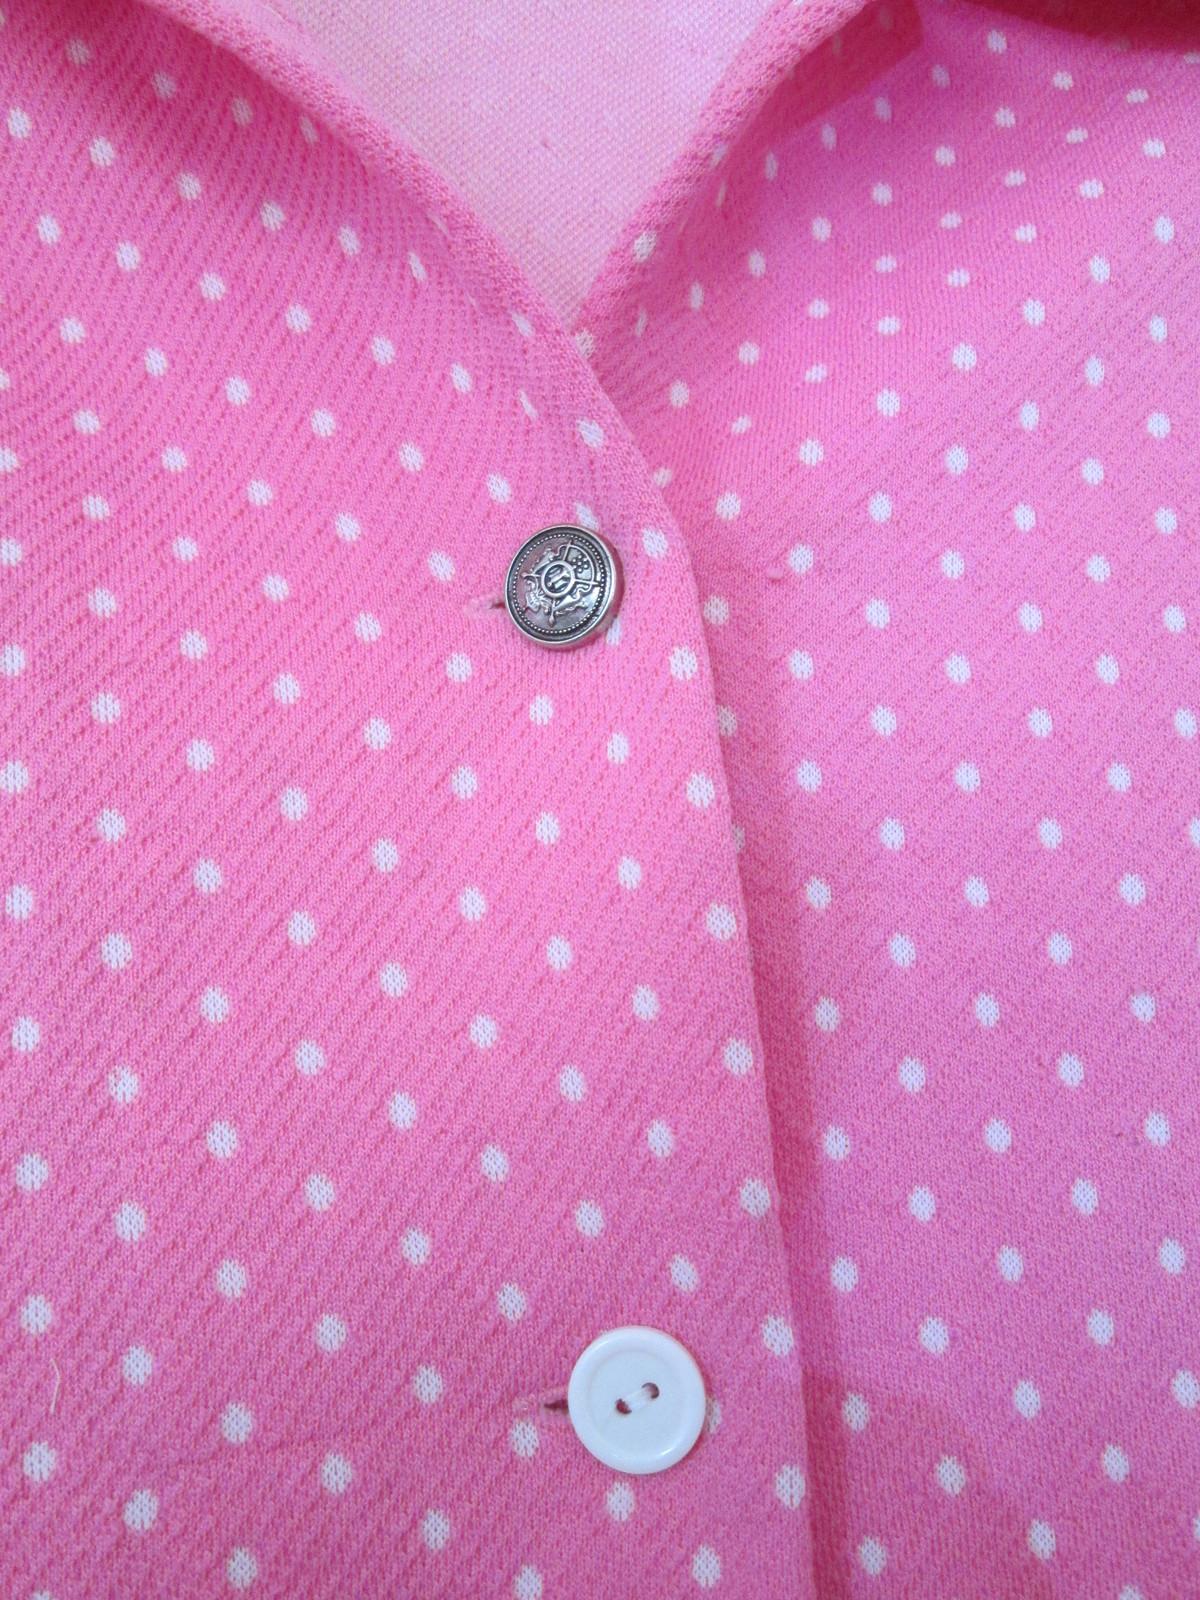 1970s vintage hot pink polkadot polyester jacket size large 8 10